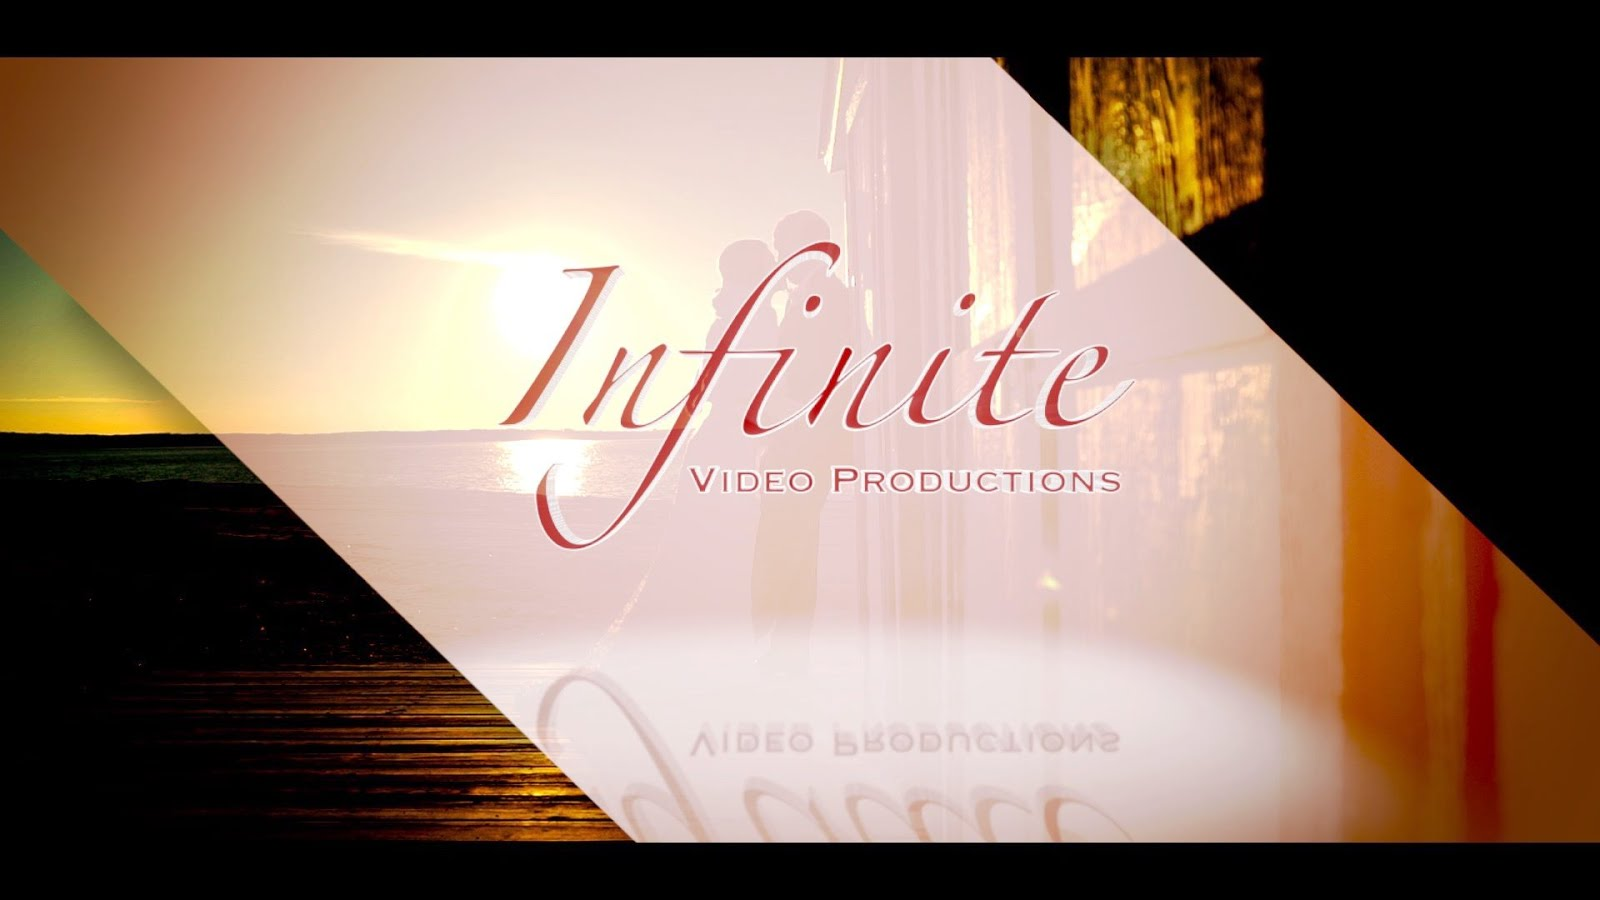 Visit Infinite Video Productions Website